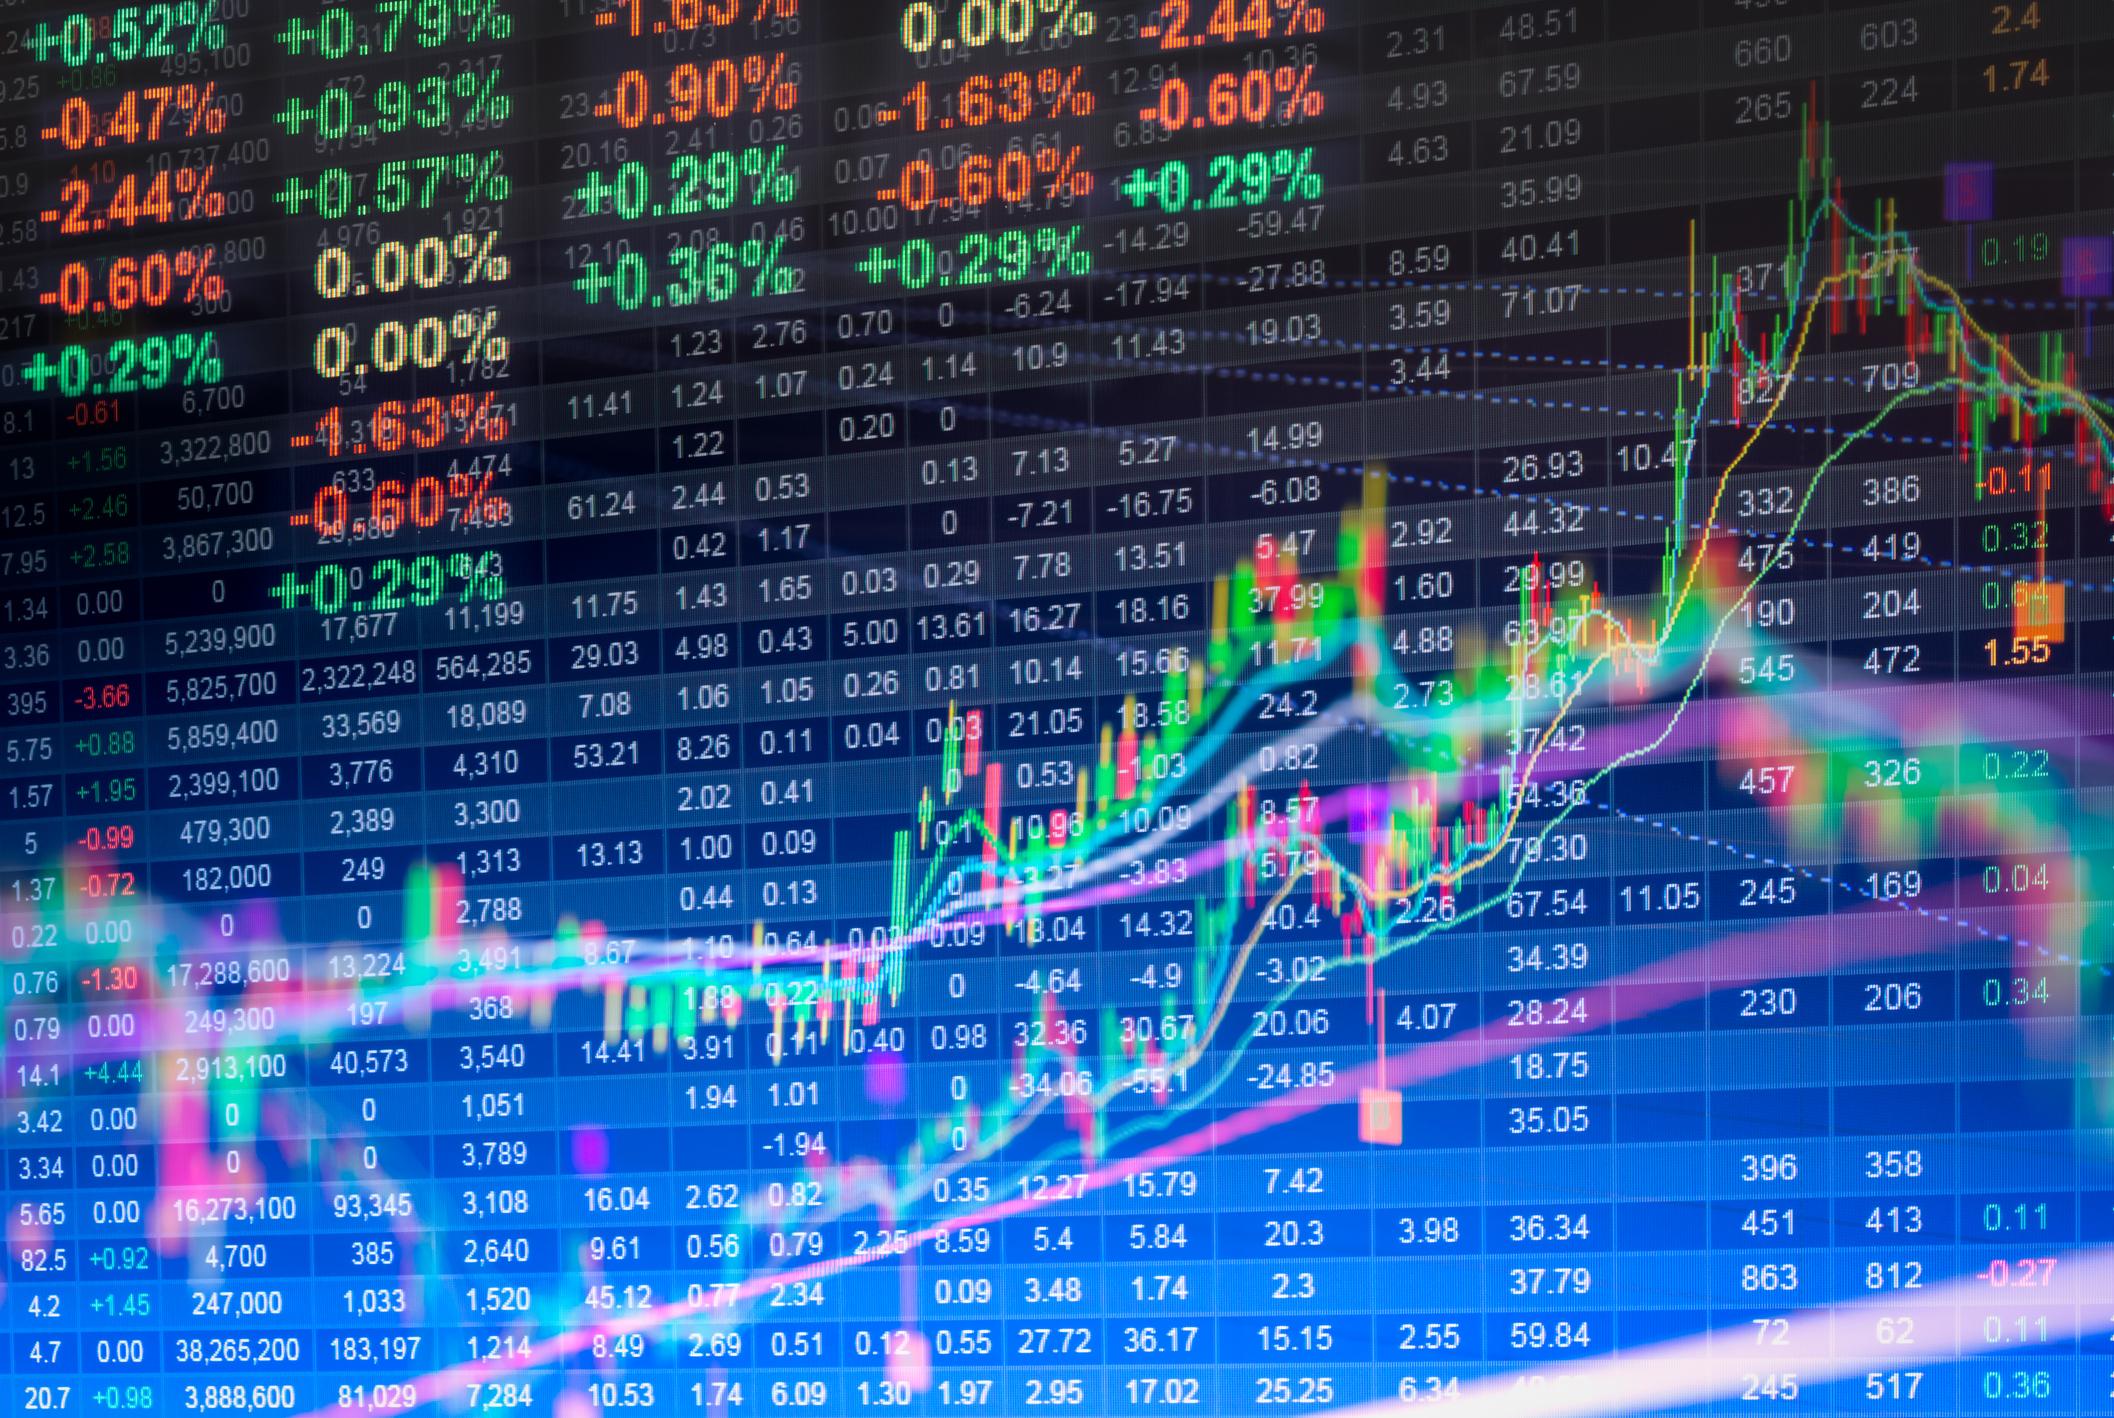 Stock market data and charts indicating volatility